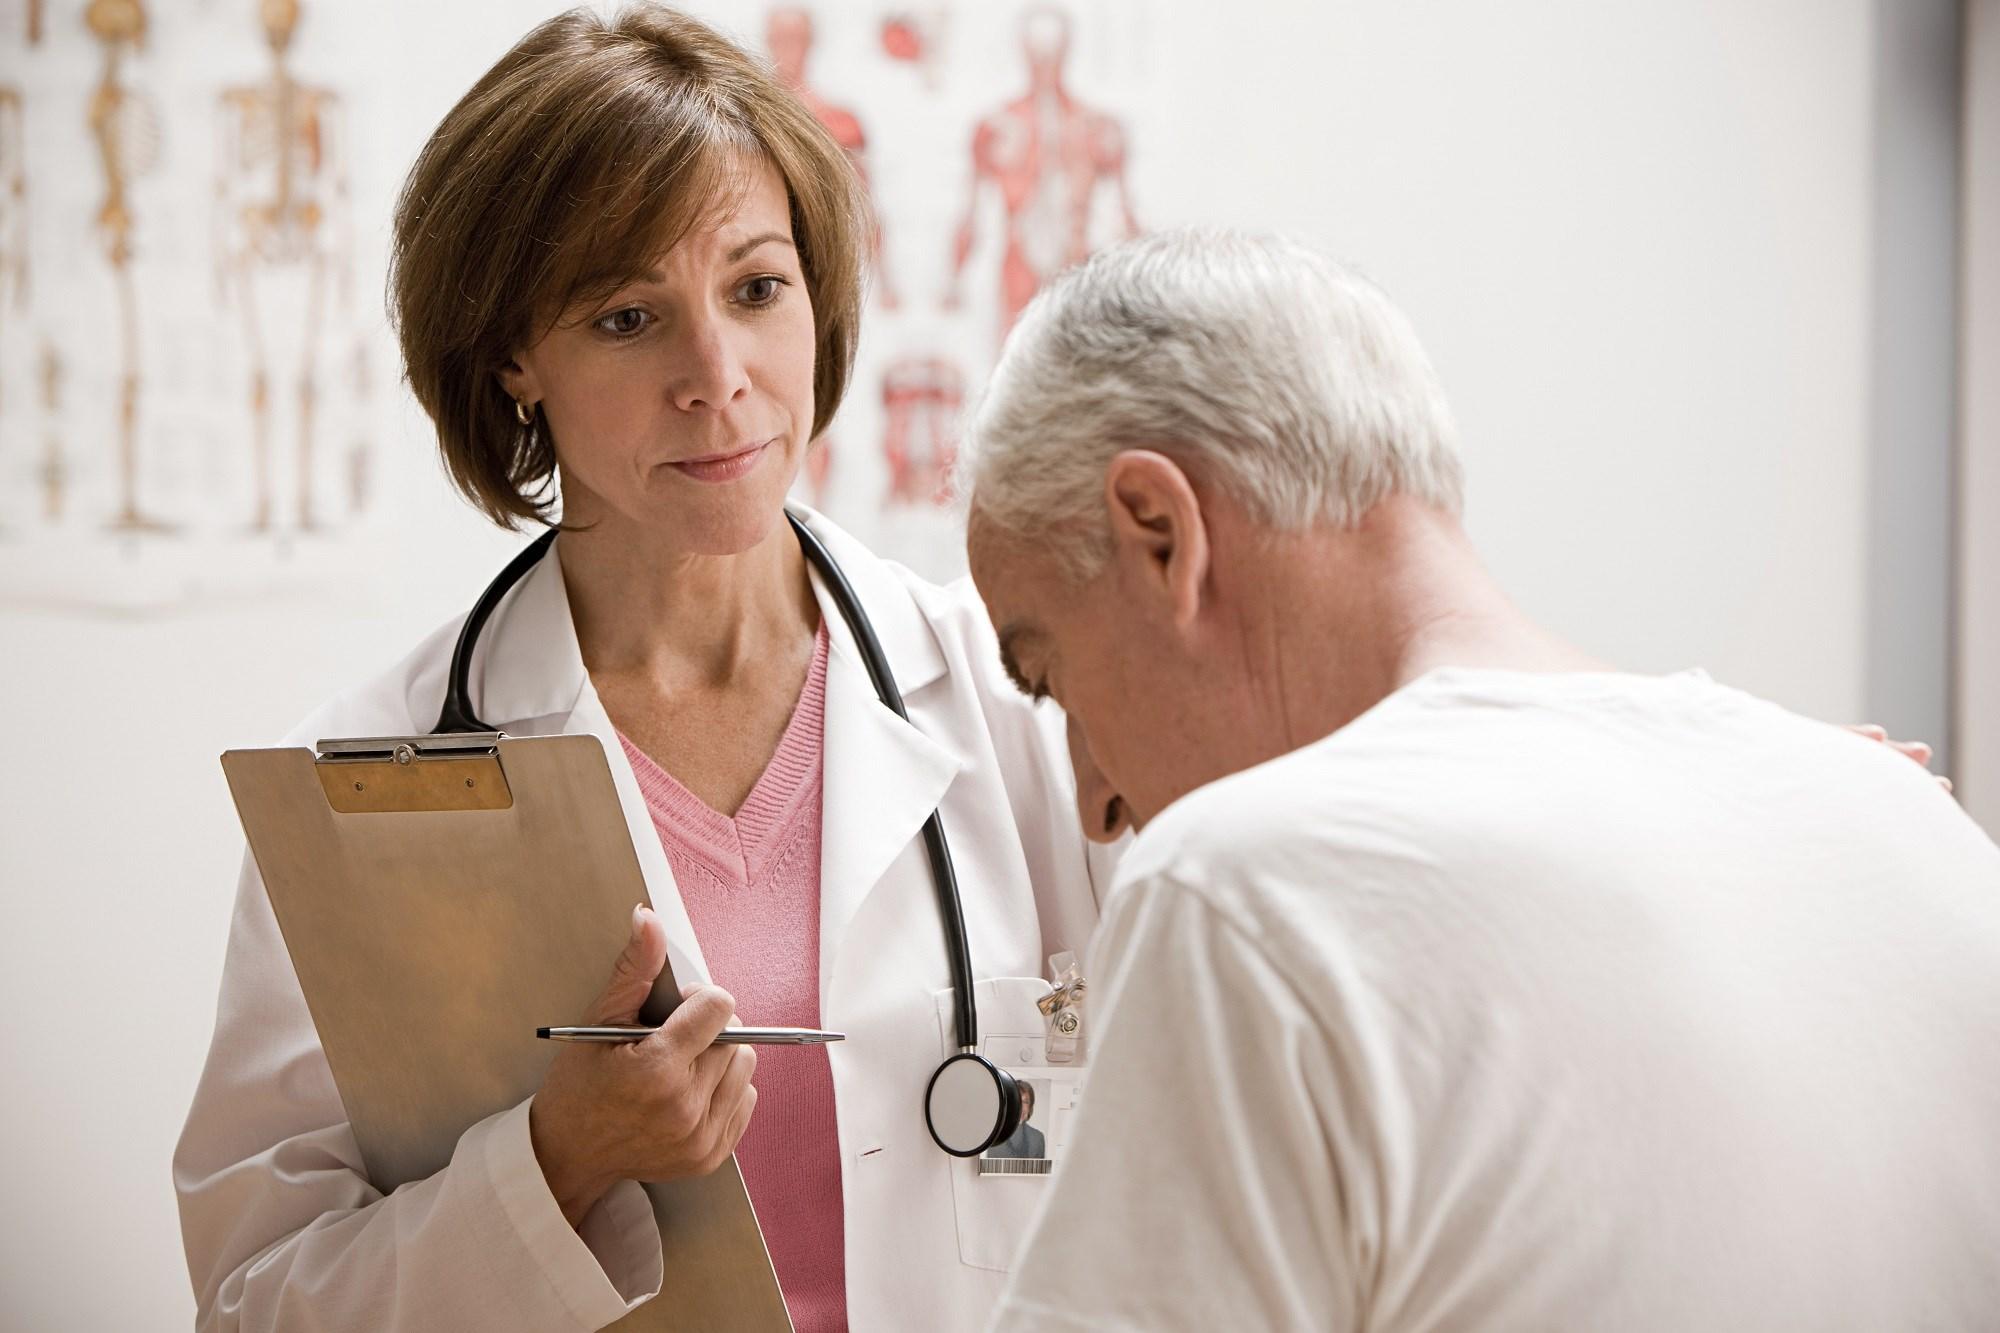 Collaborative Care Improves Depression but Not Incident Diabetes